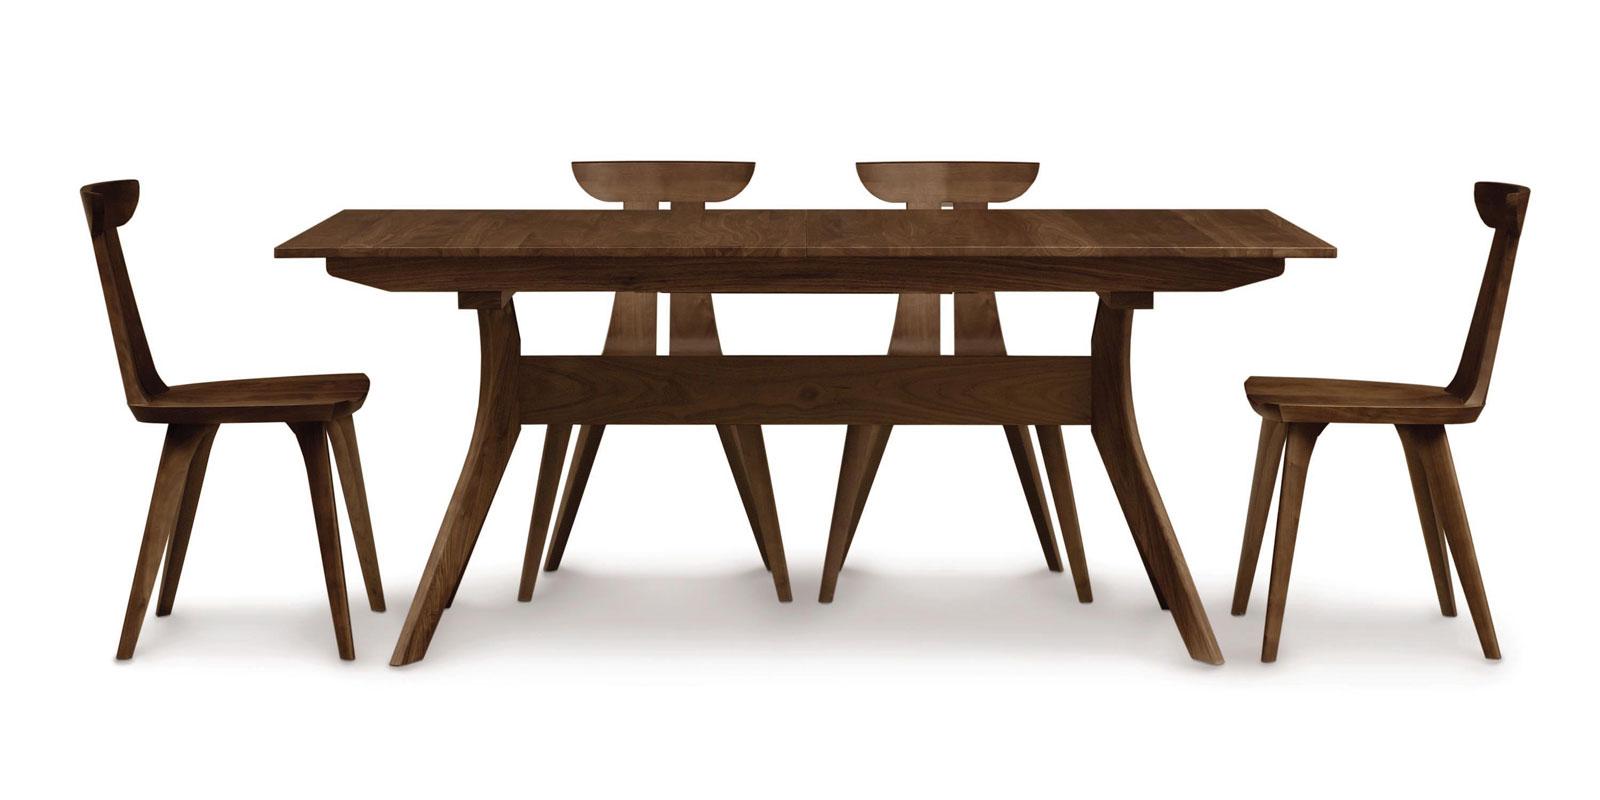 Copeland Audrey Extension Table In Walnut Ohio Hardwood